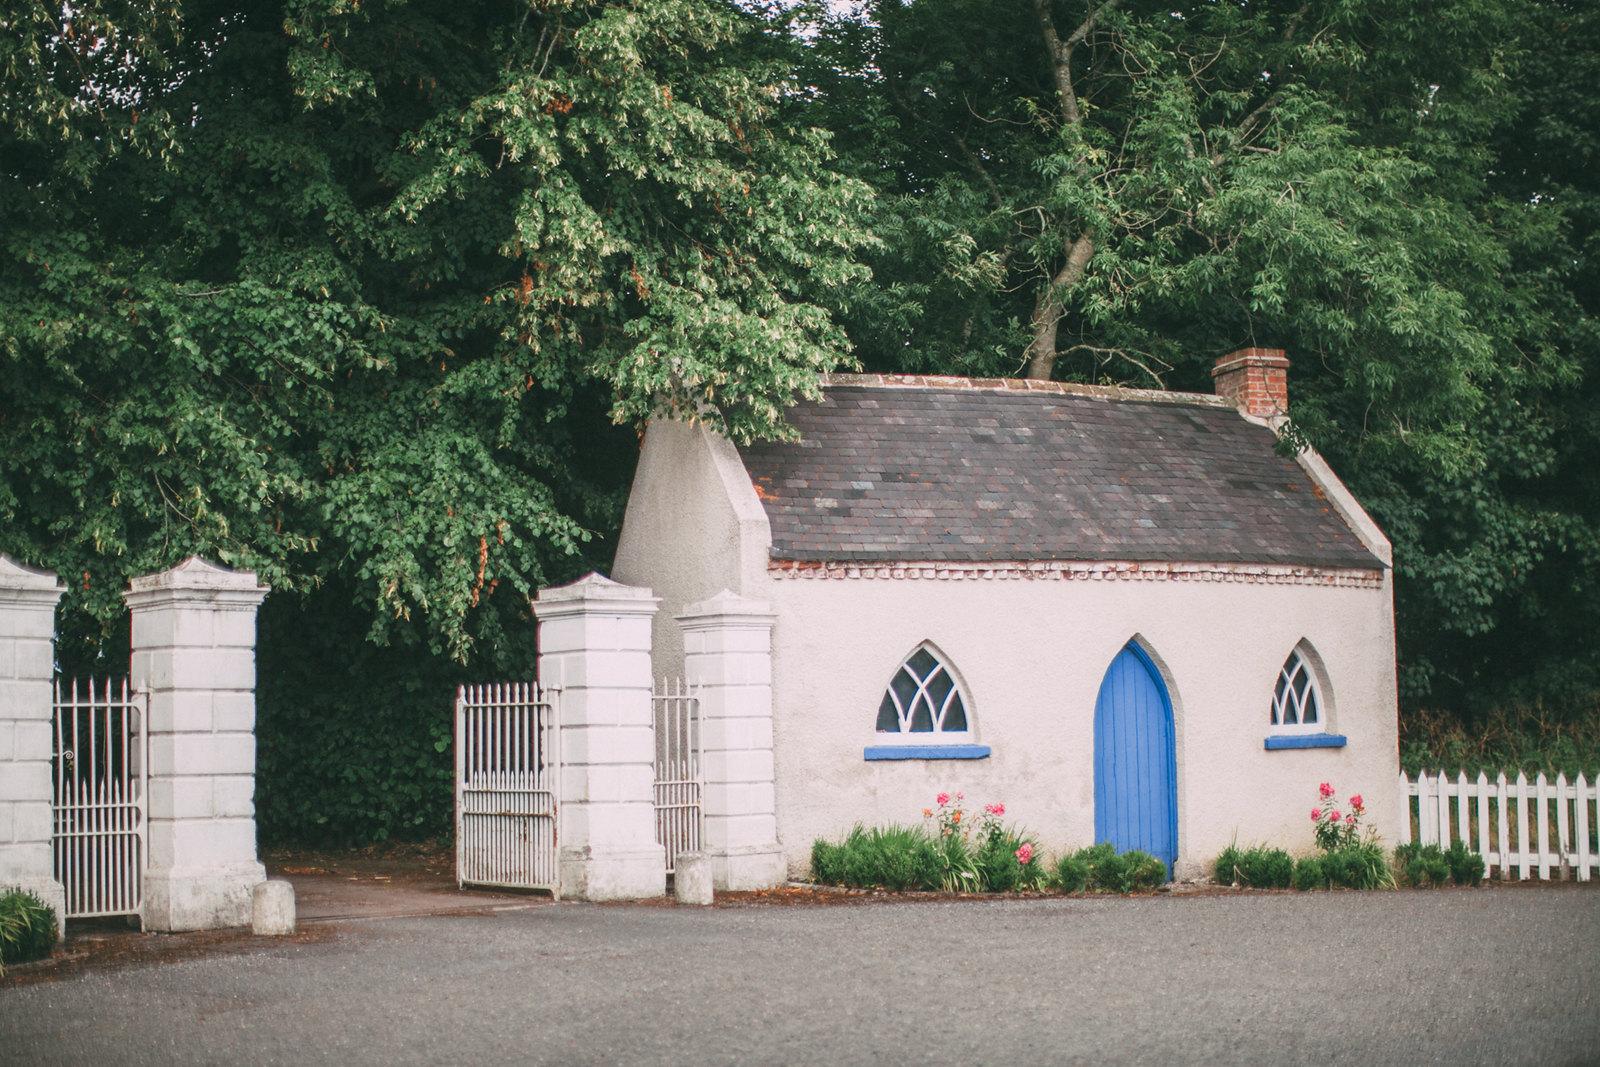 summerisland gatehouses-22